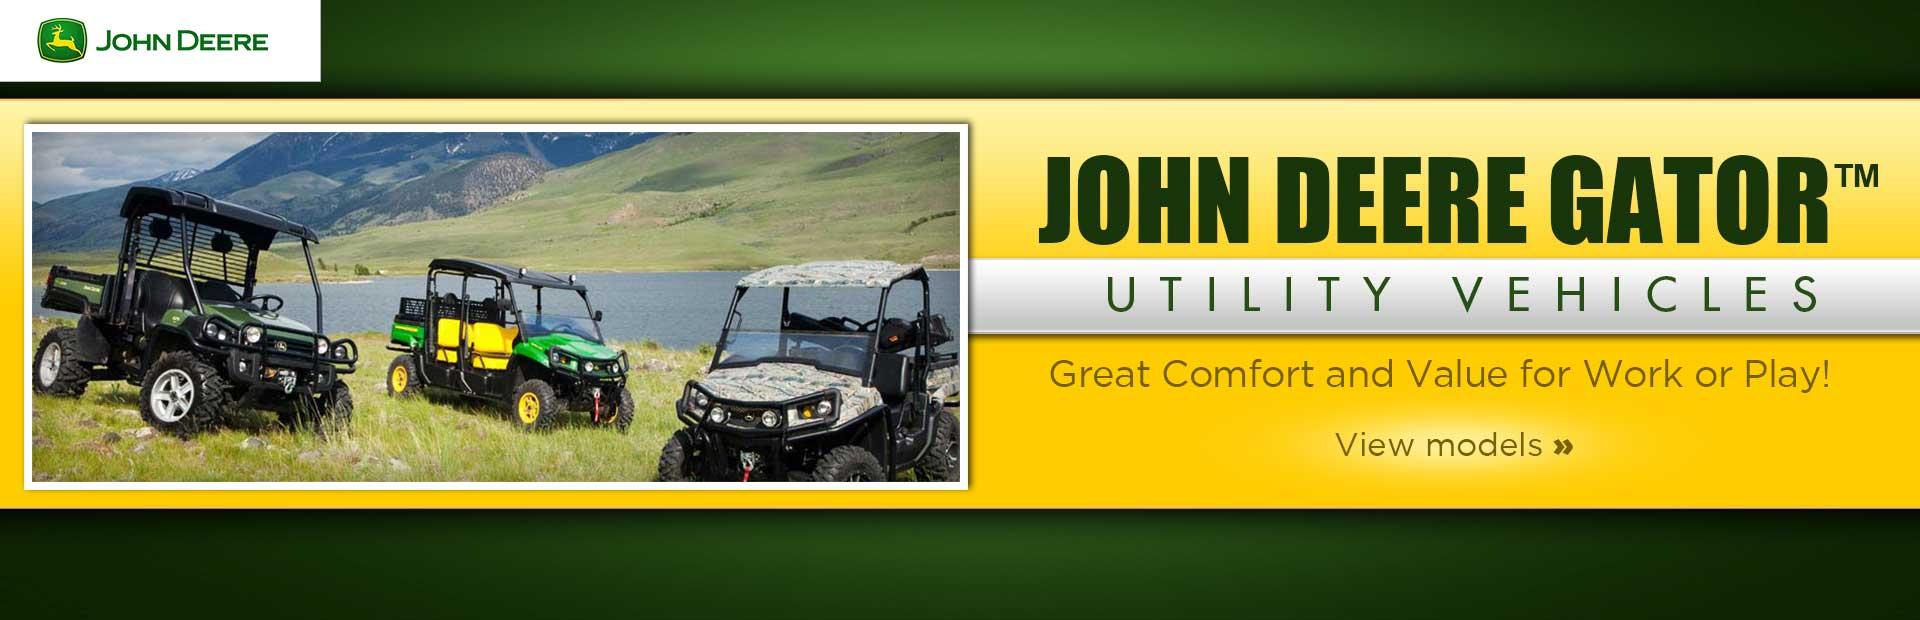 Click here to view John Deere Gator™ utility vehicles.